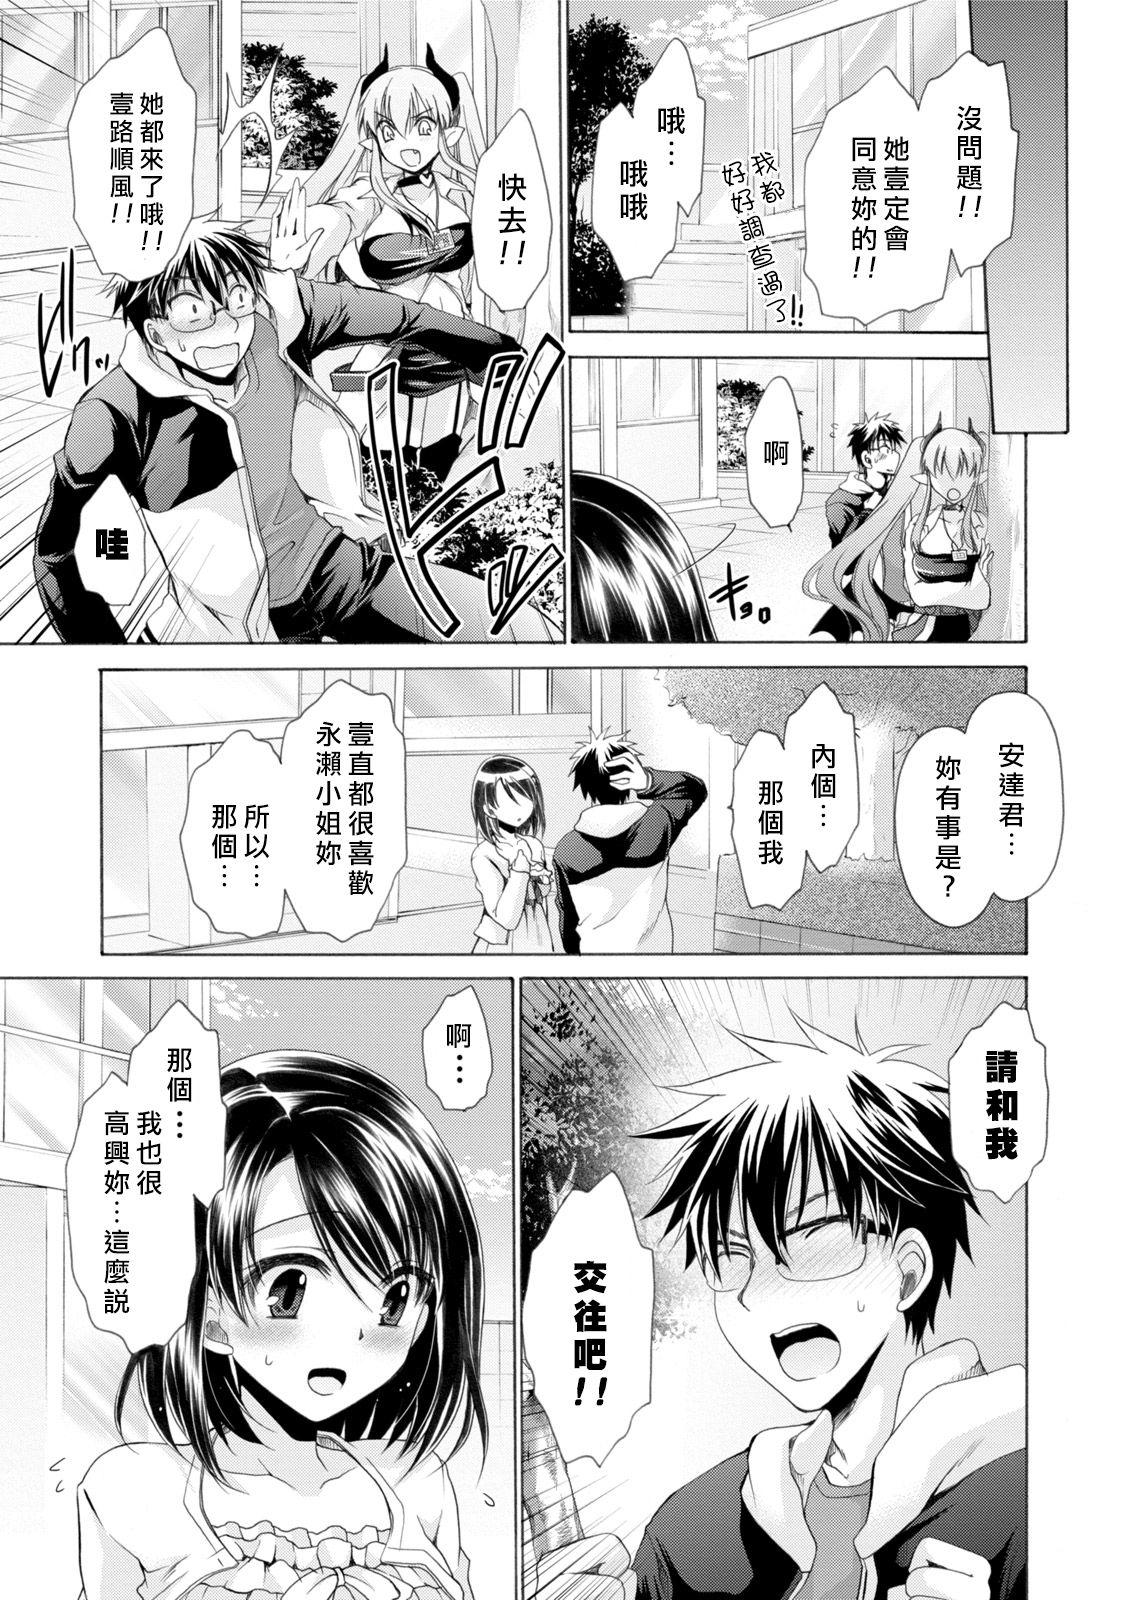 [Shinonome Ryu] Ore to Kanojo to Owaru Sekai - World's end LoveStory 1-5 [Chinese] [爱弹幕汉化组] [Digital] 24